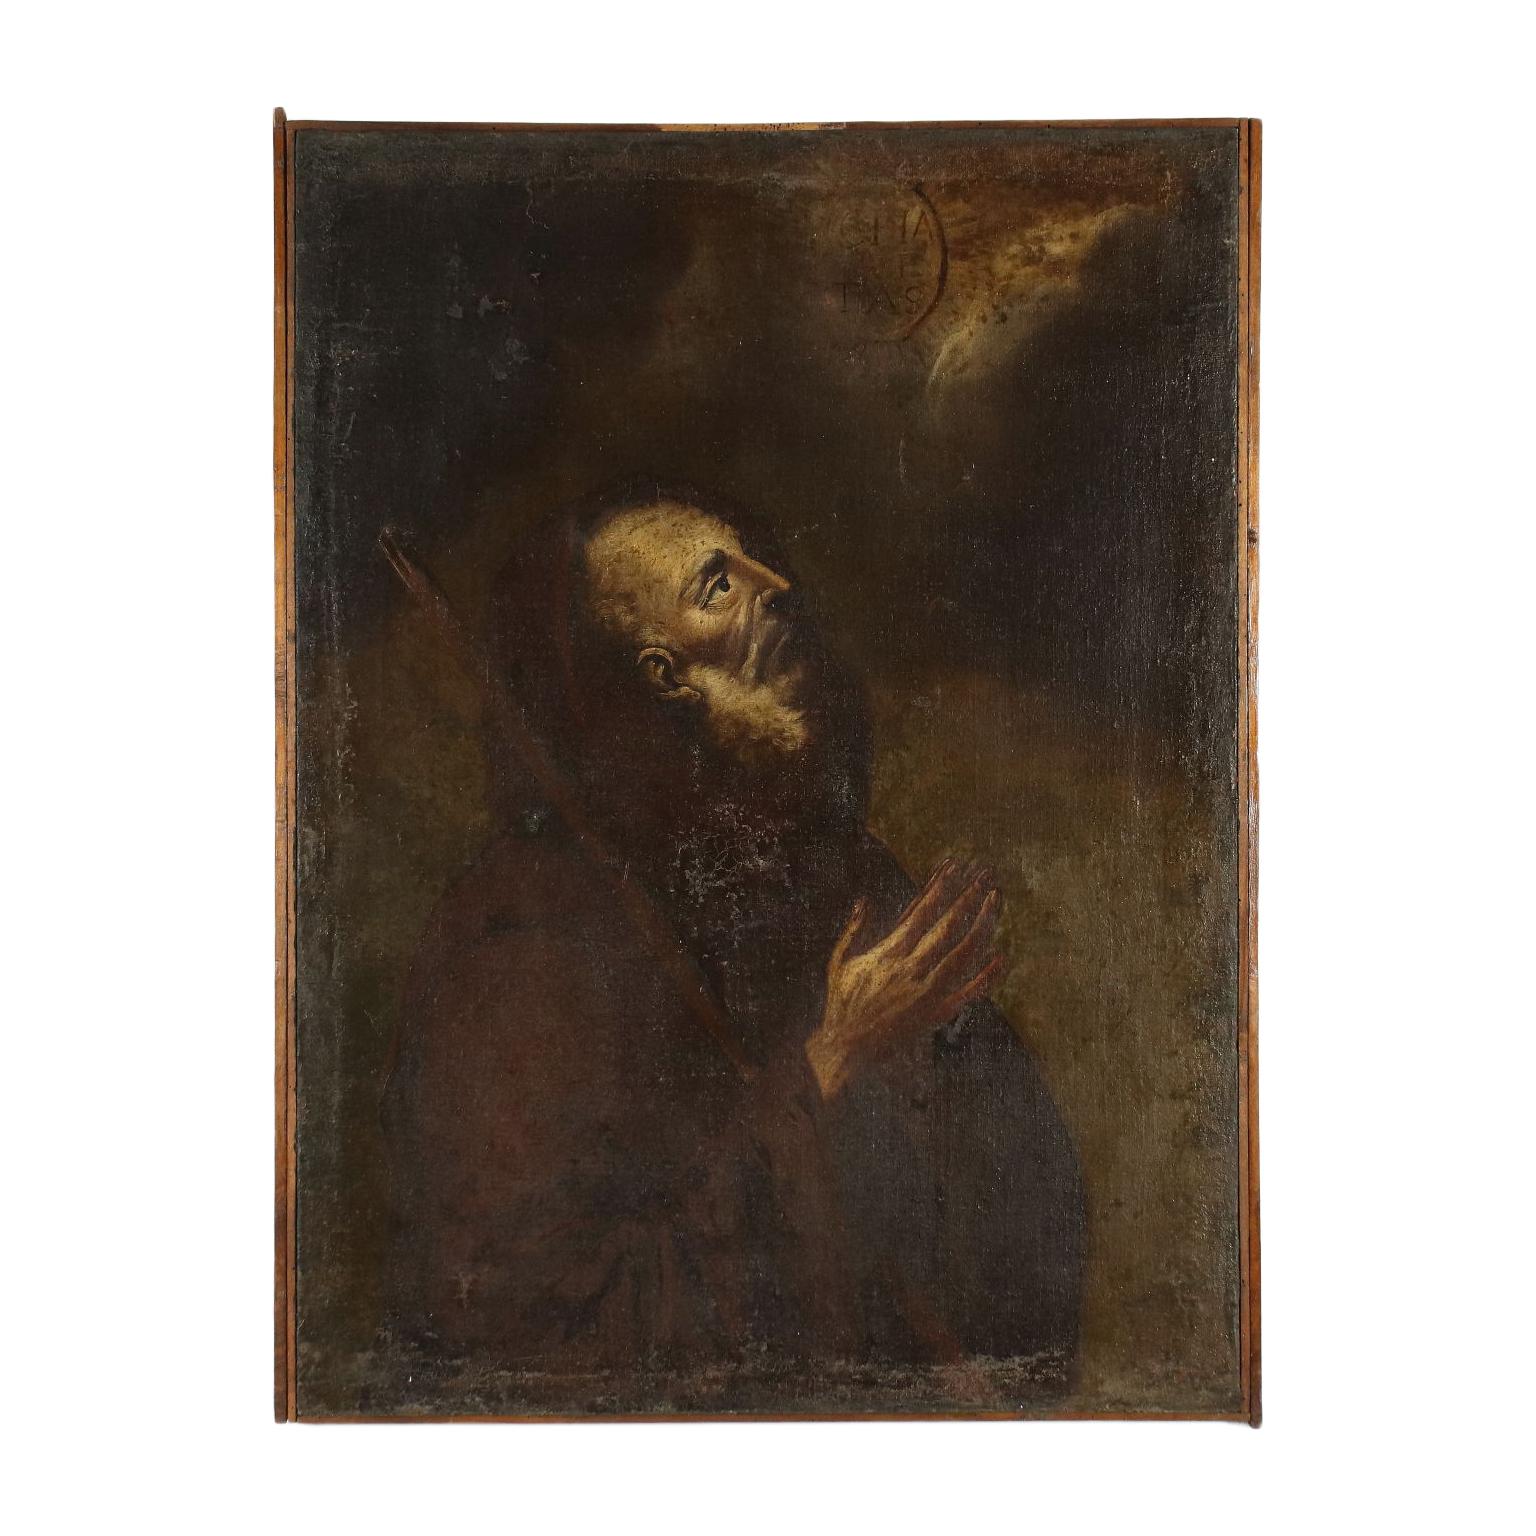 San Francesco Da Paola Pittura Antica Arte Noleggio Dimanoinmano It